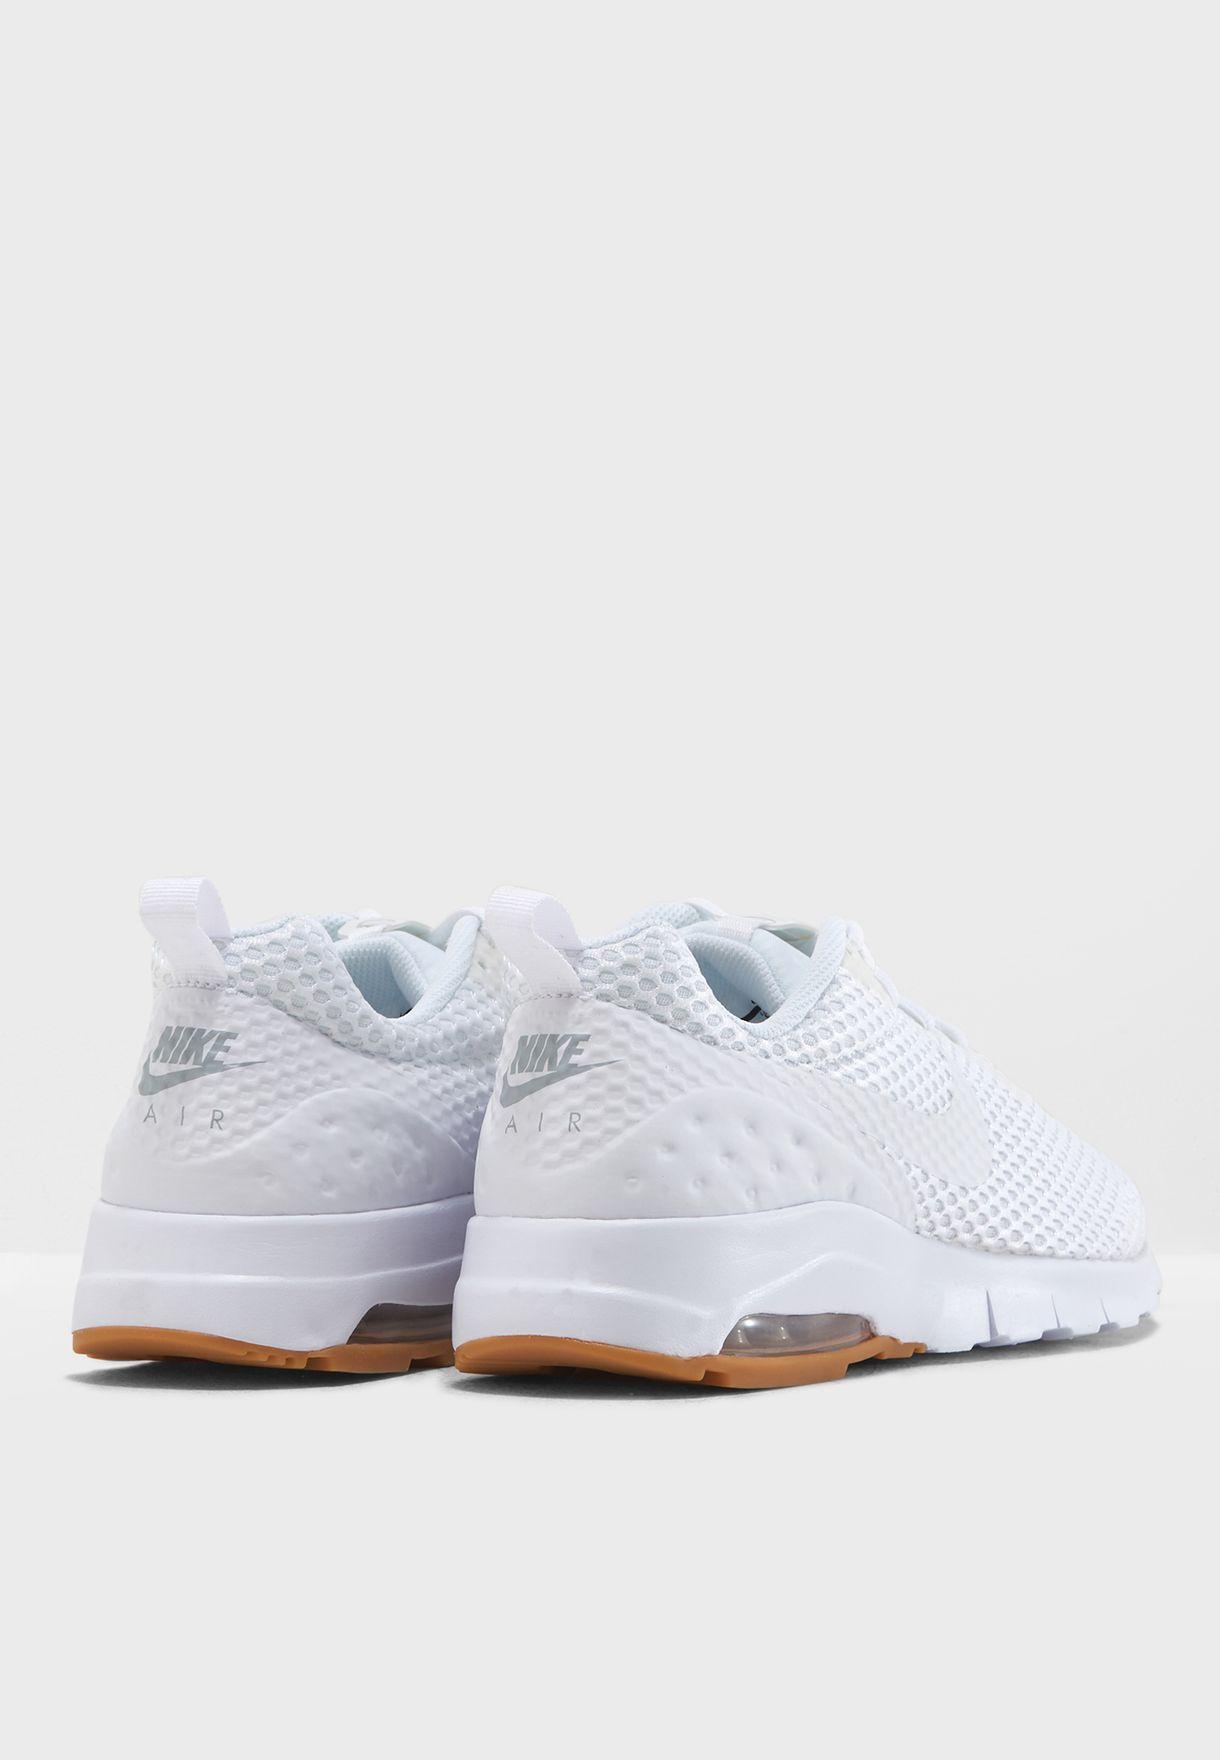 Football Factor Boys Nike Air Max Motion LW (GS) Shoe street